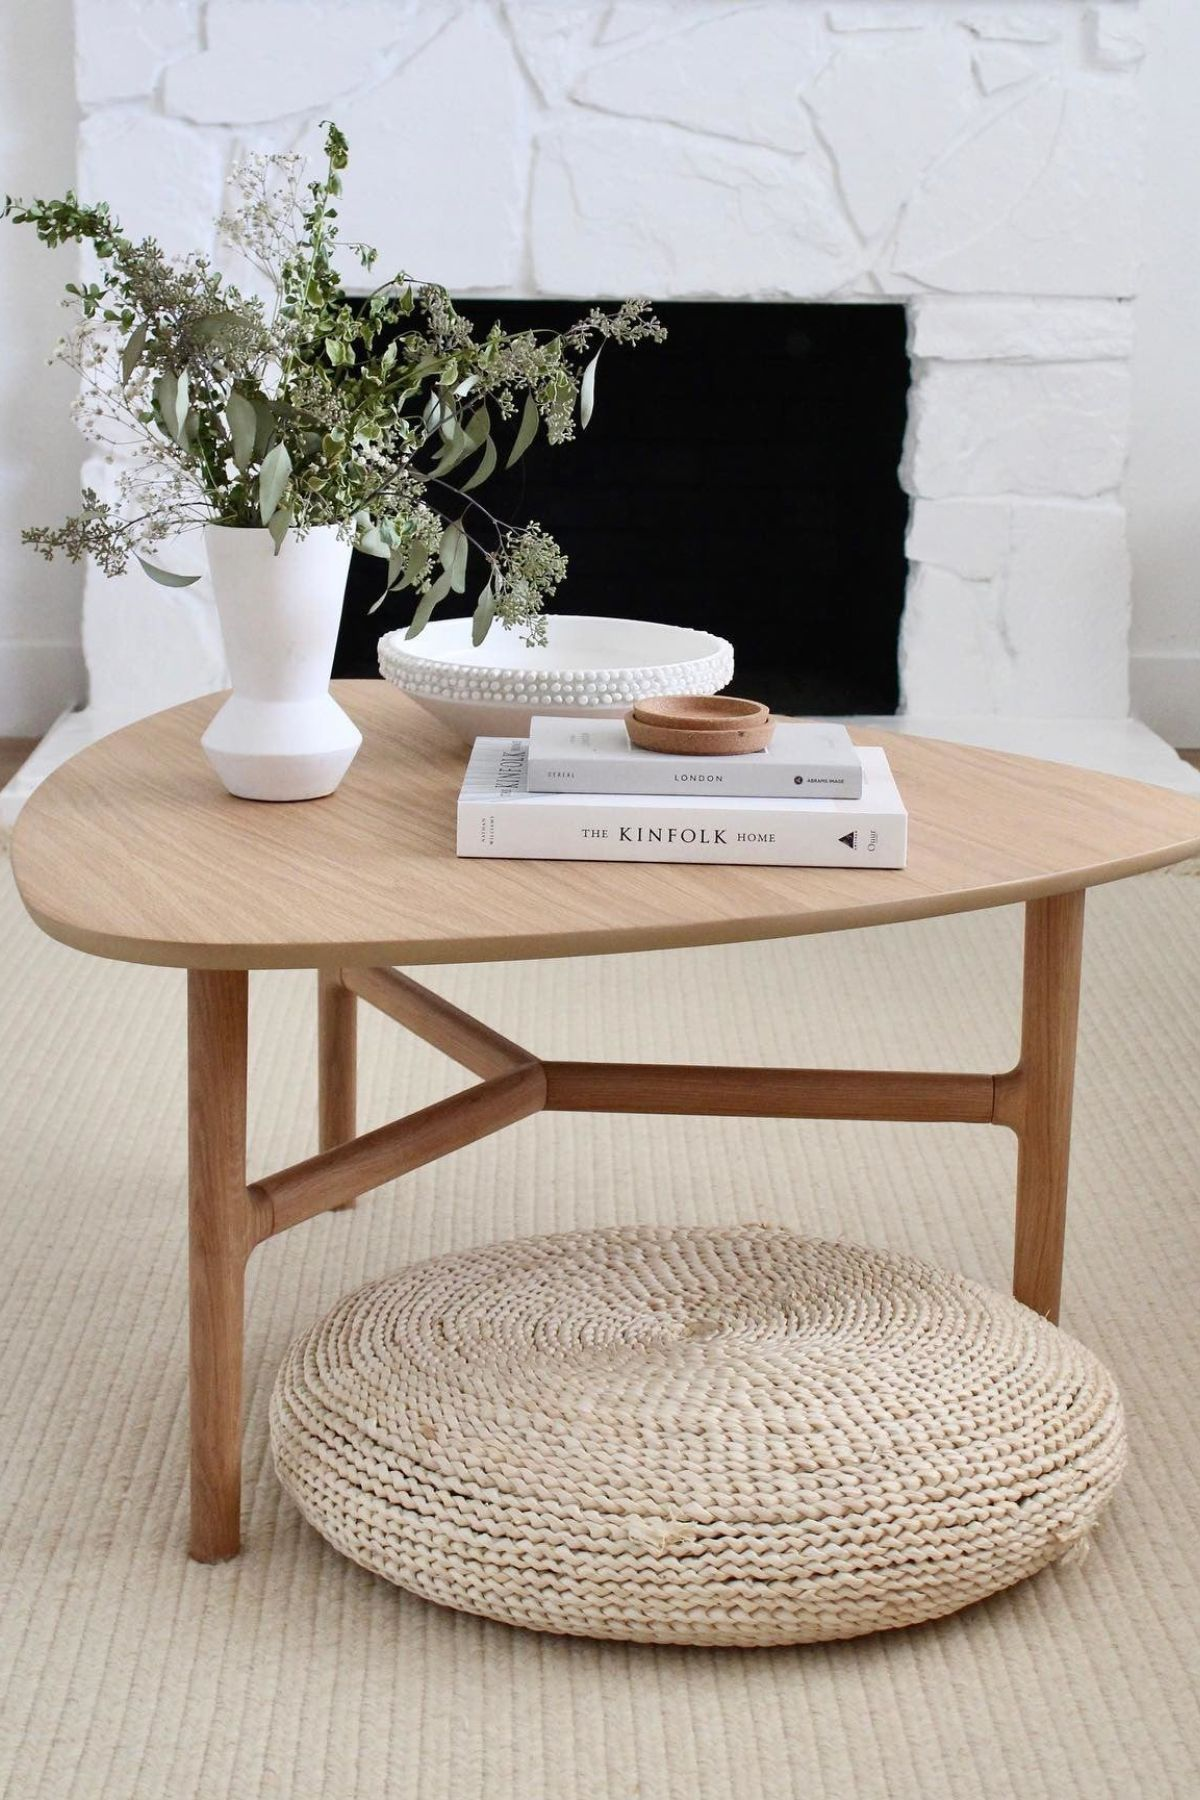 Brezza Light Oak Triangular Coffee Table In 2021 Round Coffee Table Decor Round Coffee Table Modern Scandi Coffee Table [ 1800 x 1200 Pixel ]